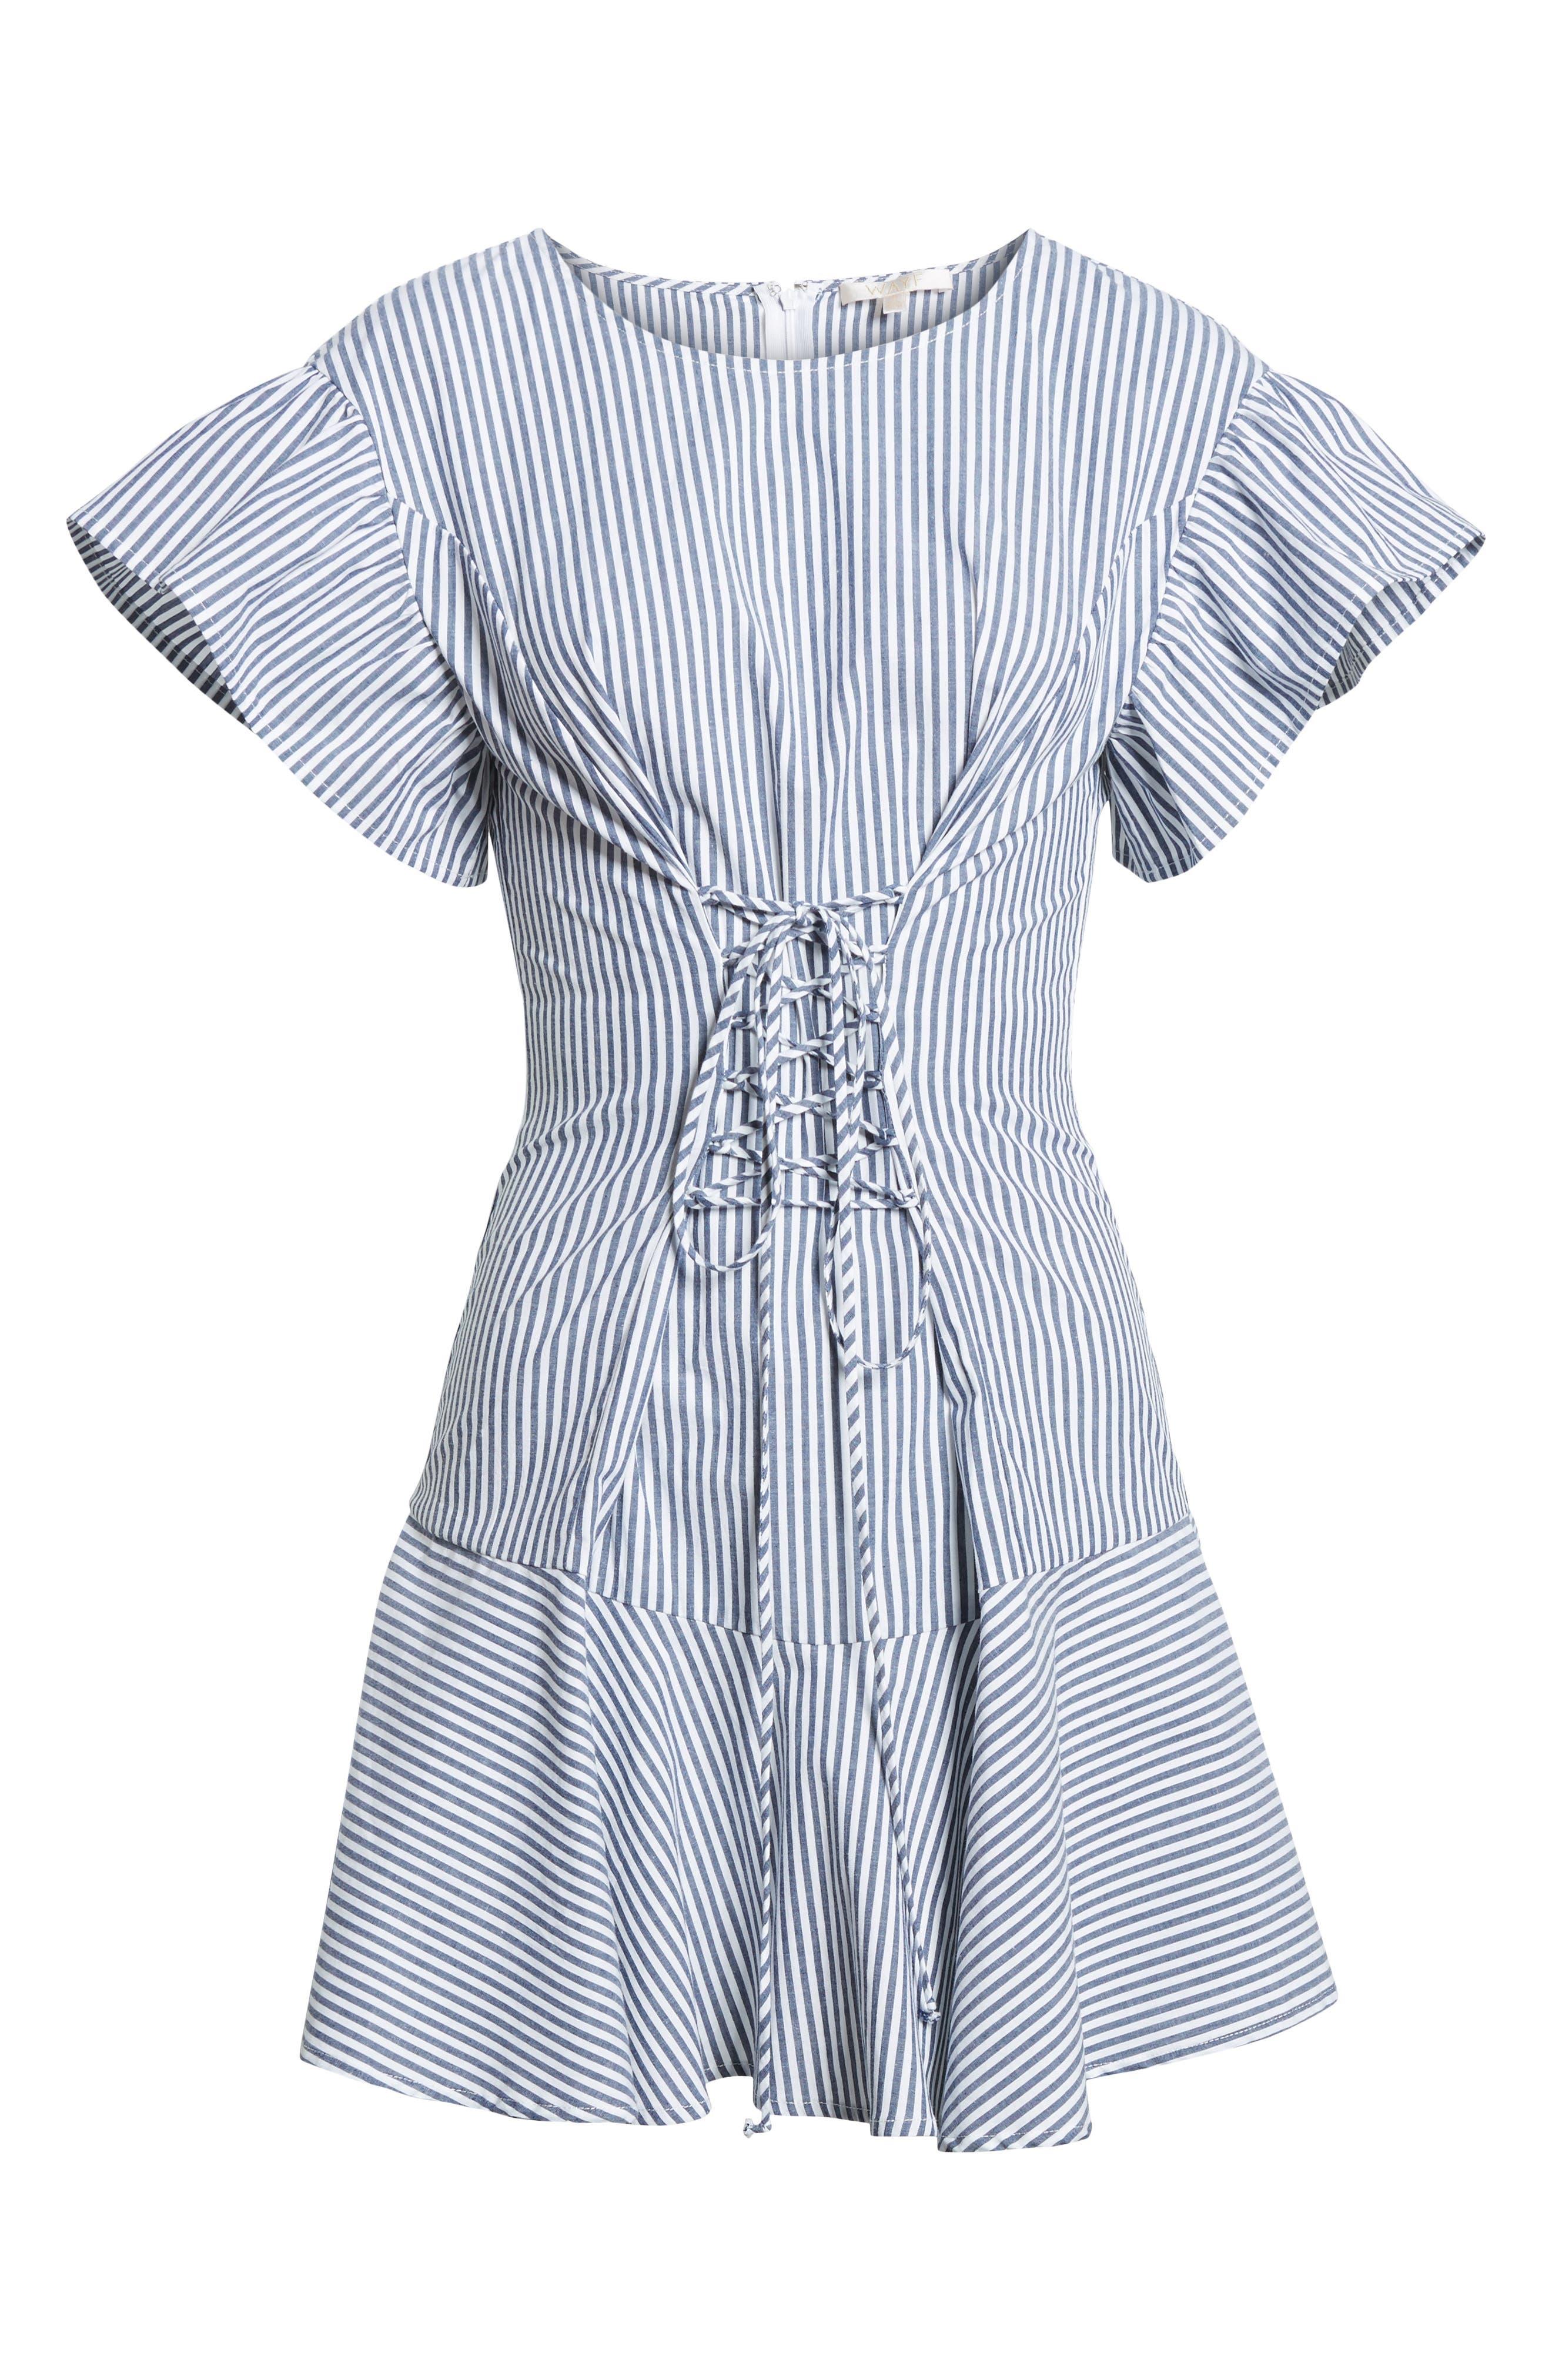 Lace-Up Minidress,                             Alternate thumbnail 6, color,                             400